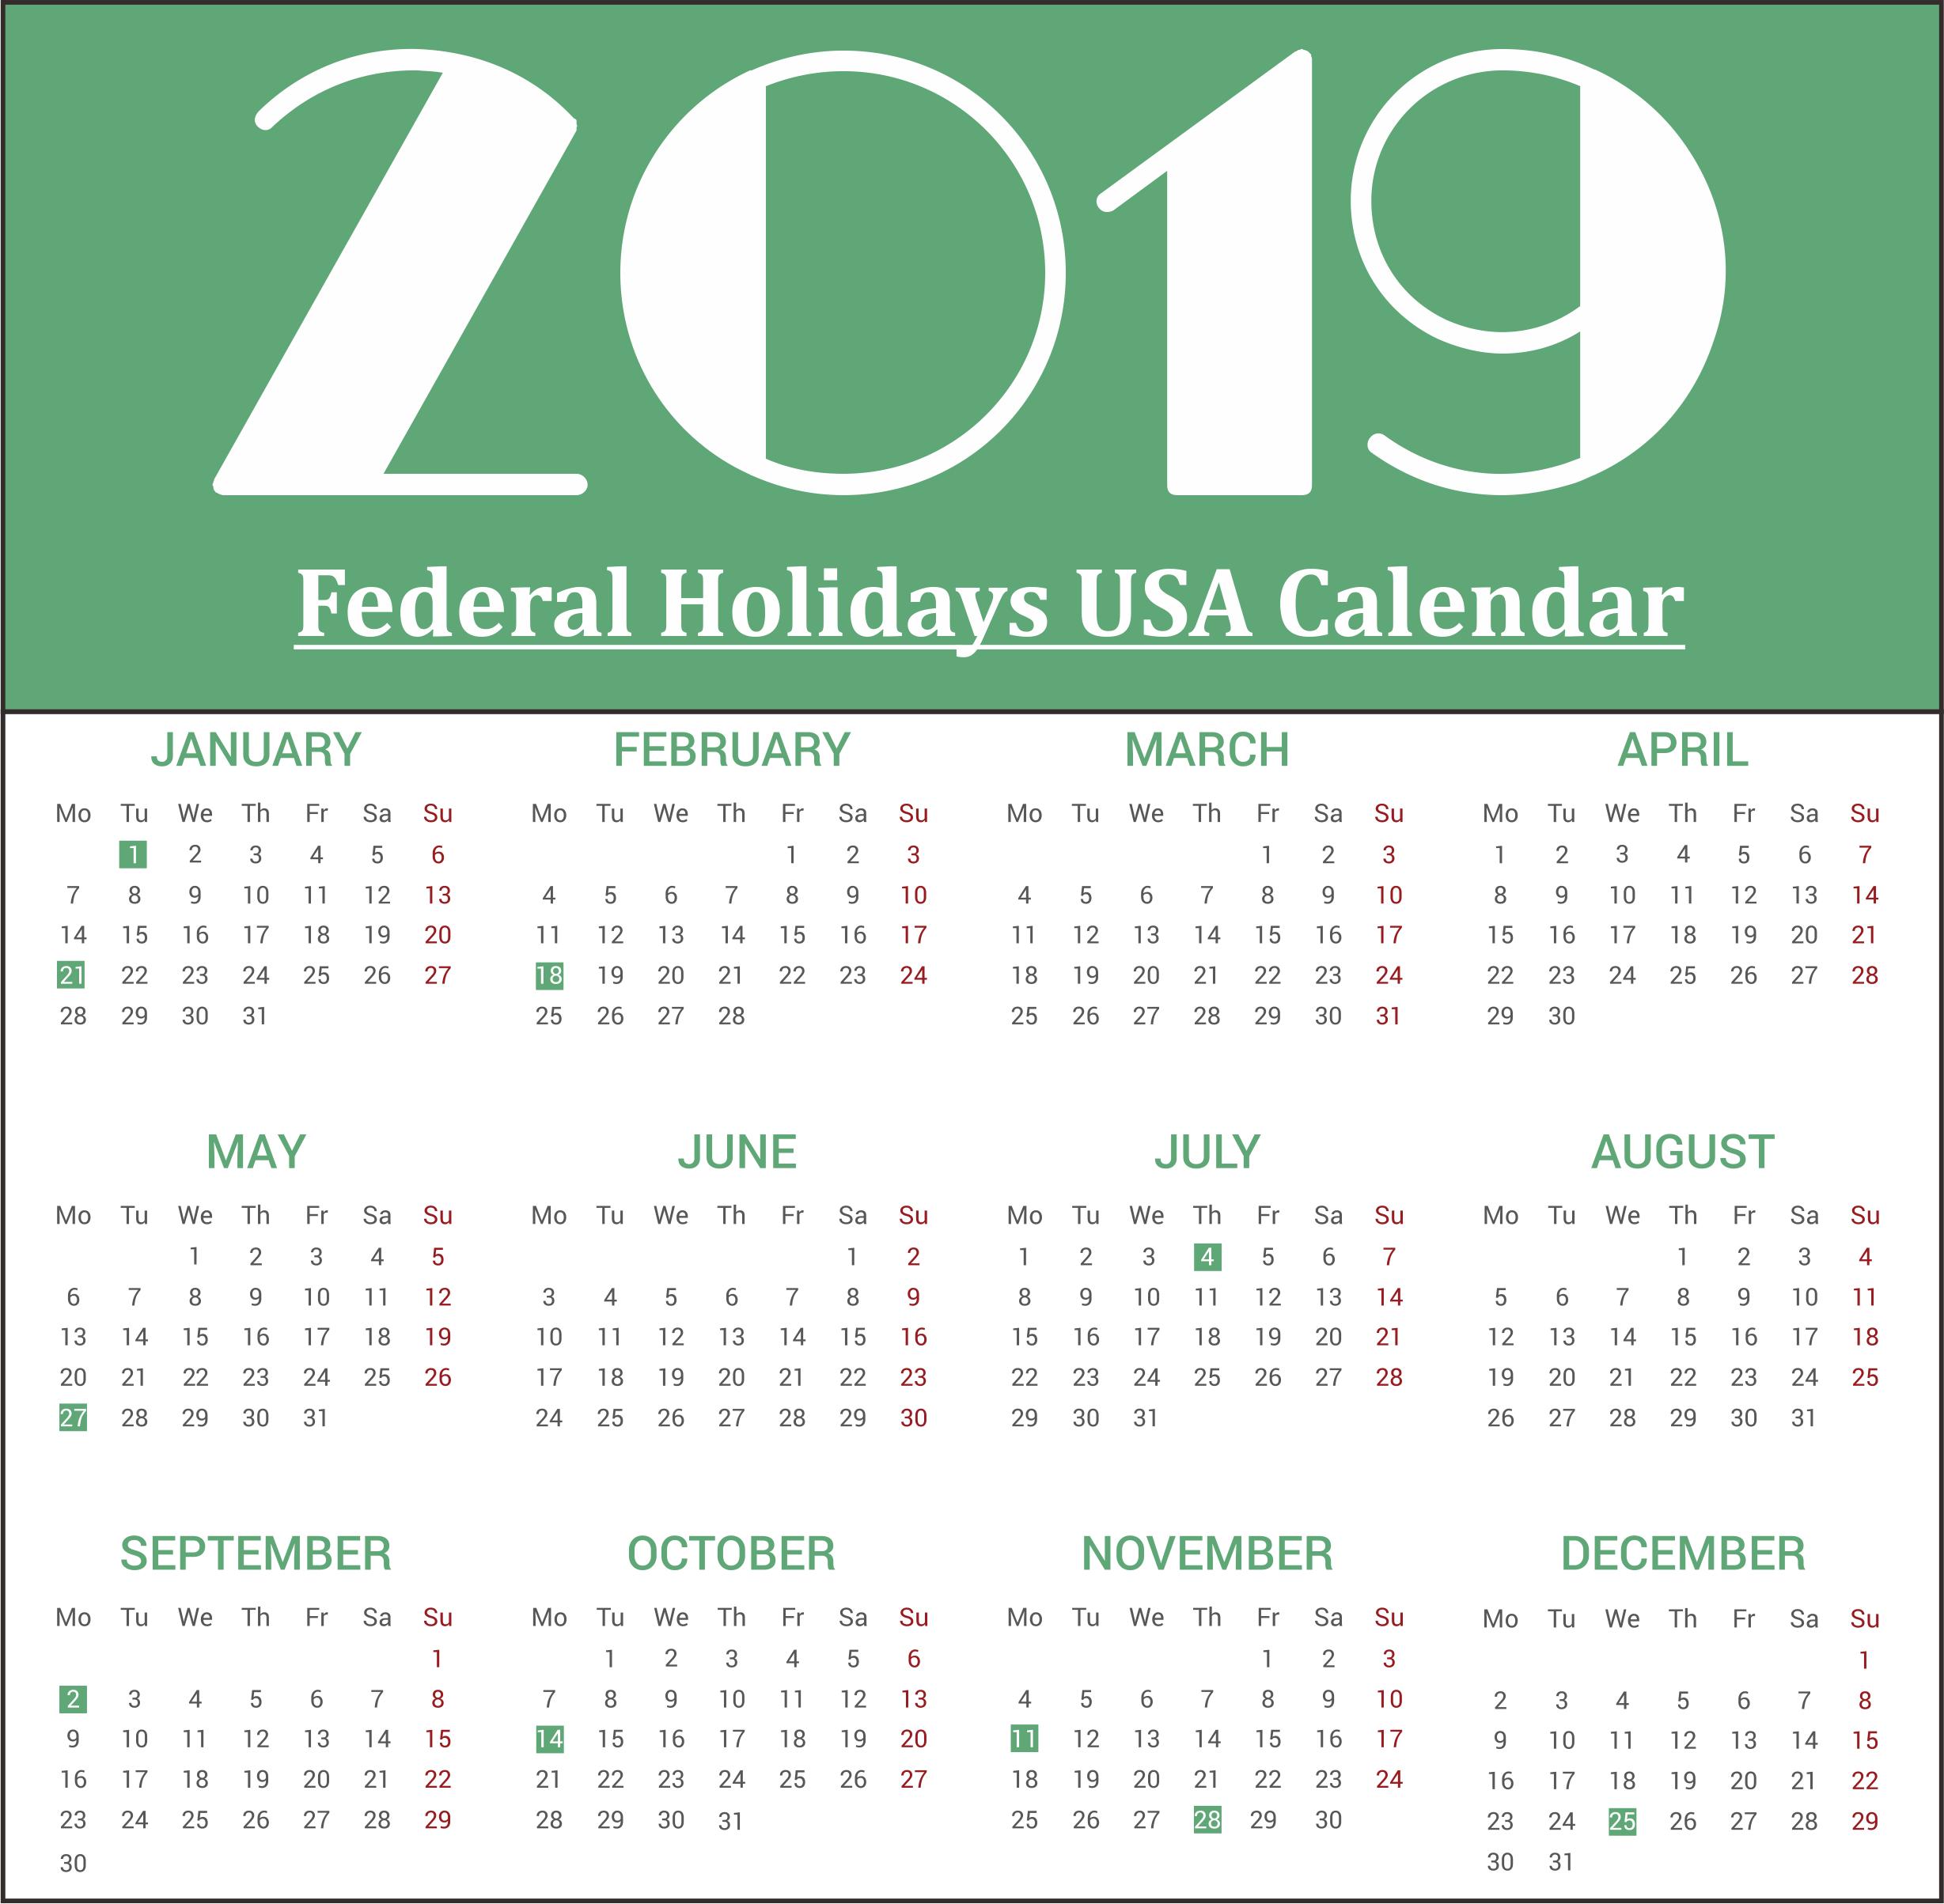 USA (United State of America) Federal Holidays Print 2019